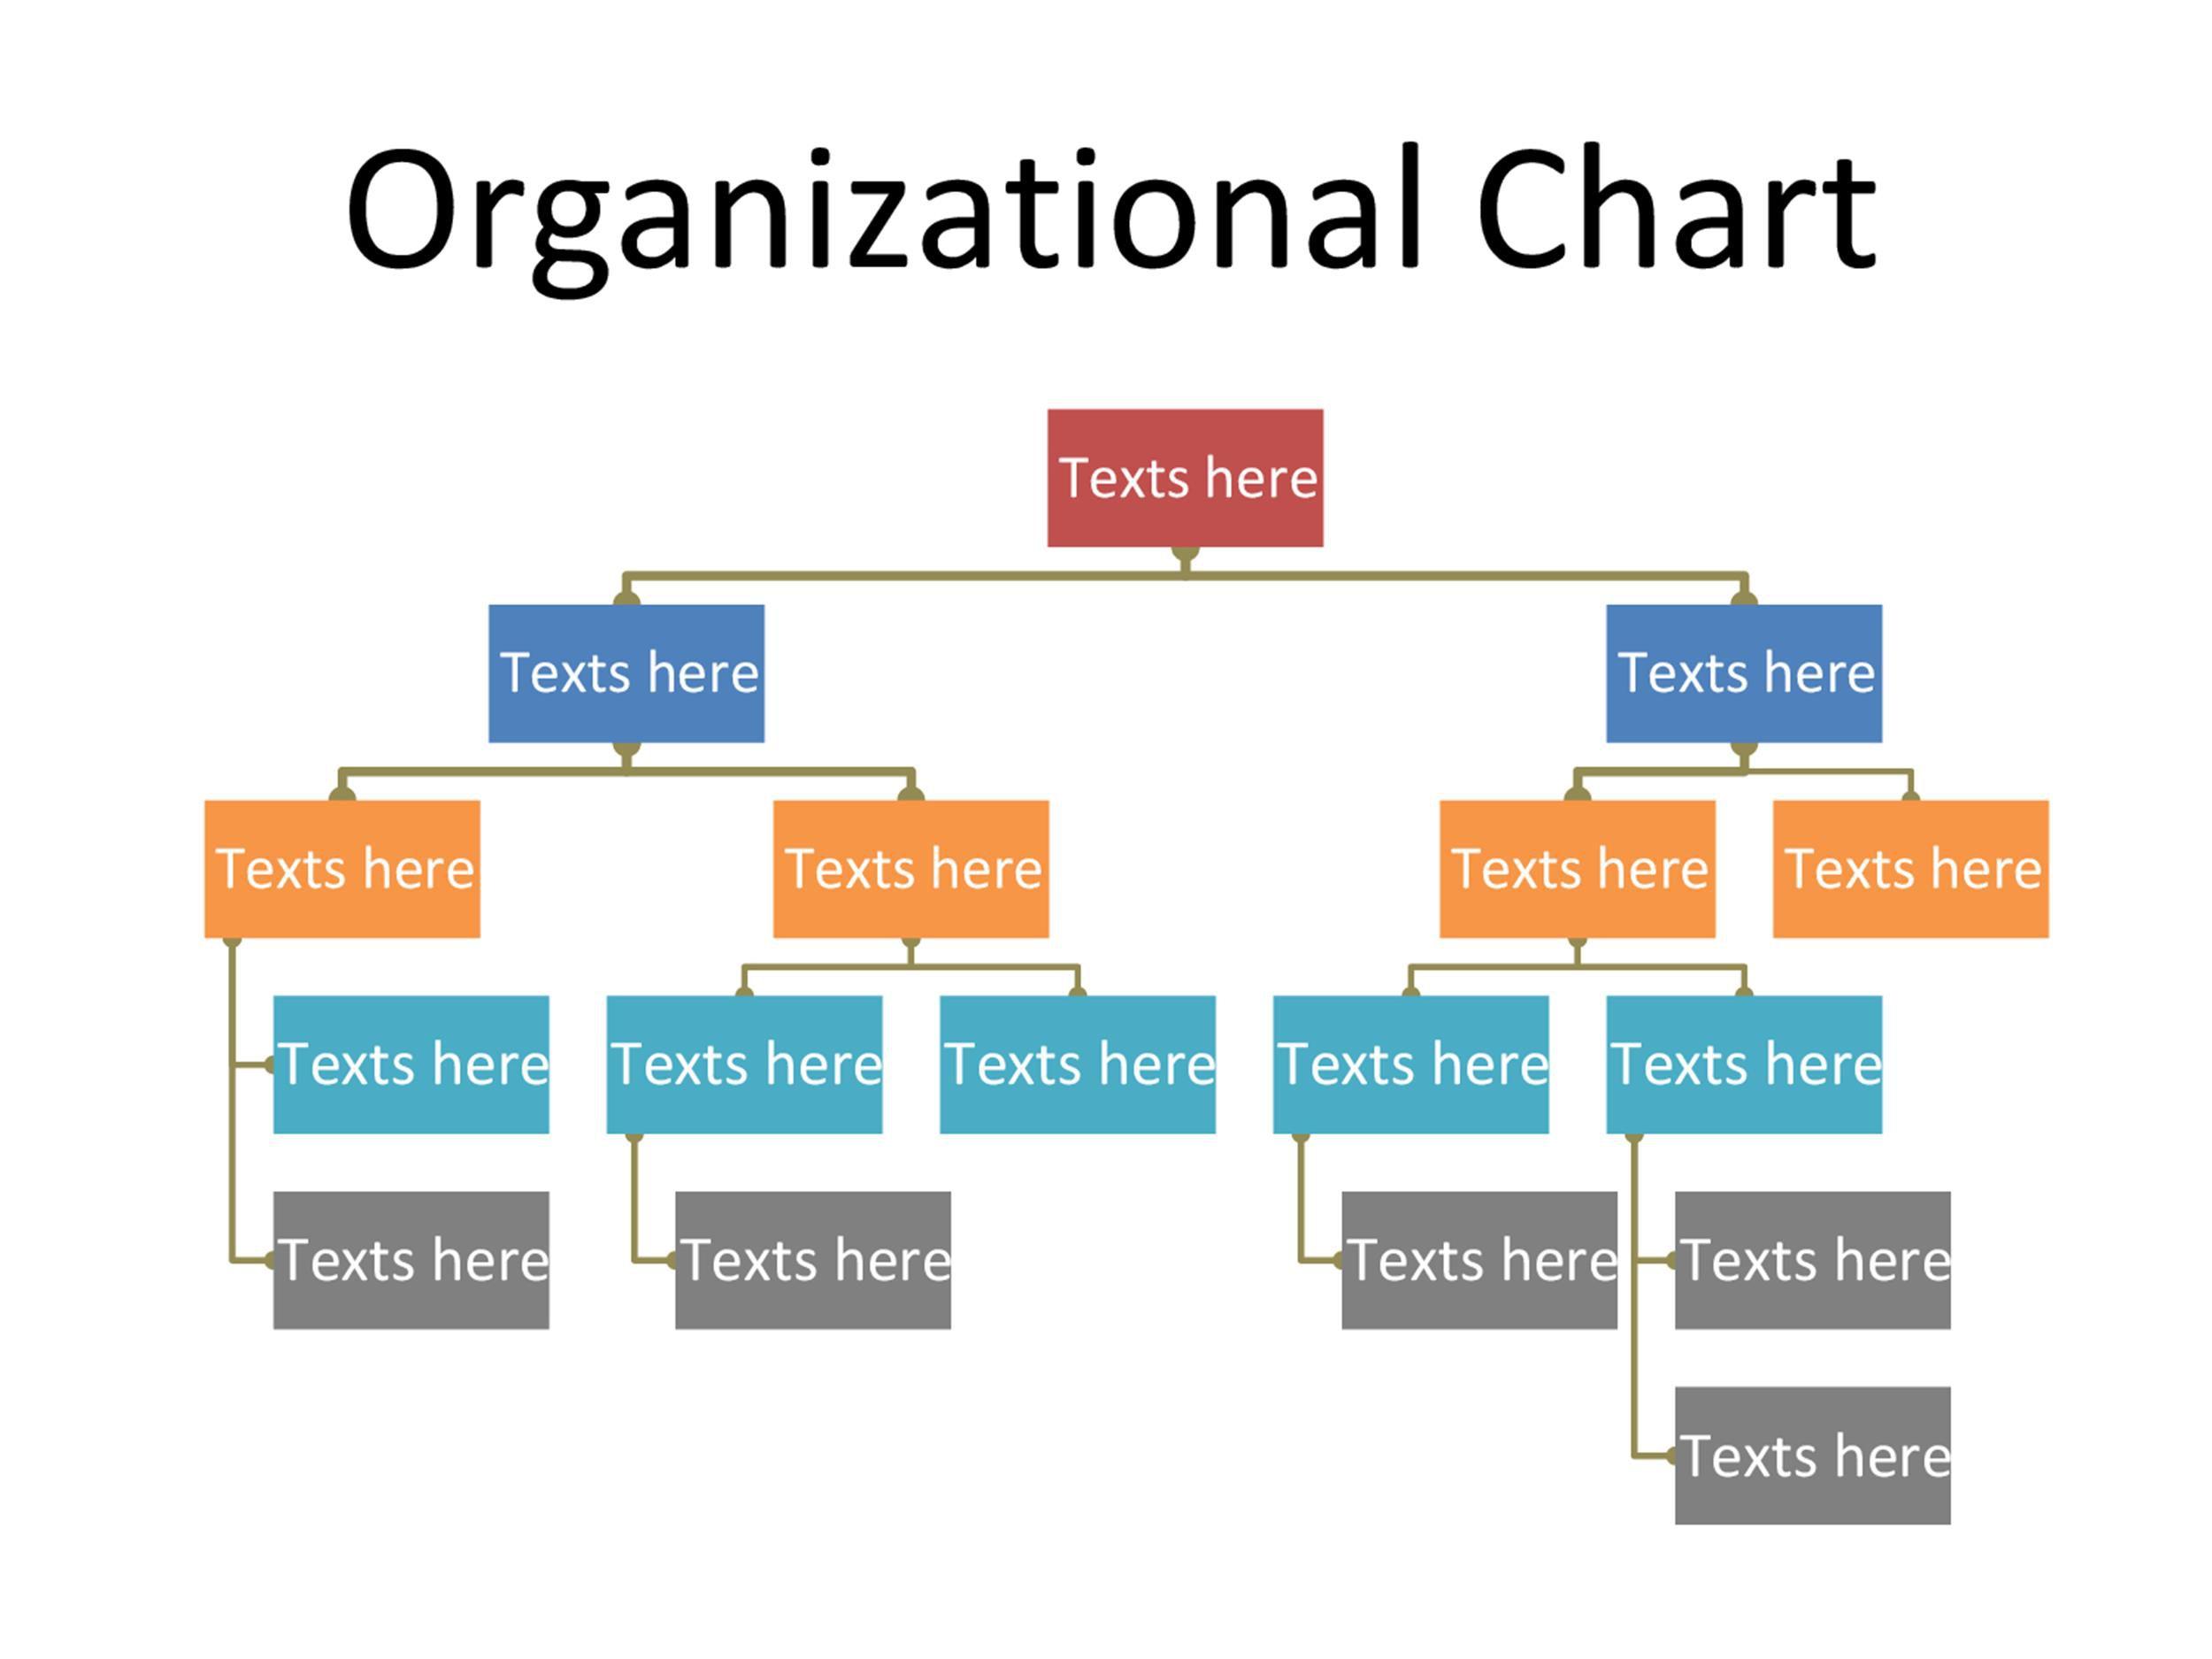 005 Simple Organizational Chart Template Word Design  2013 2010 2007Full